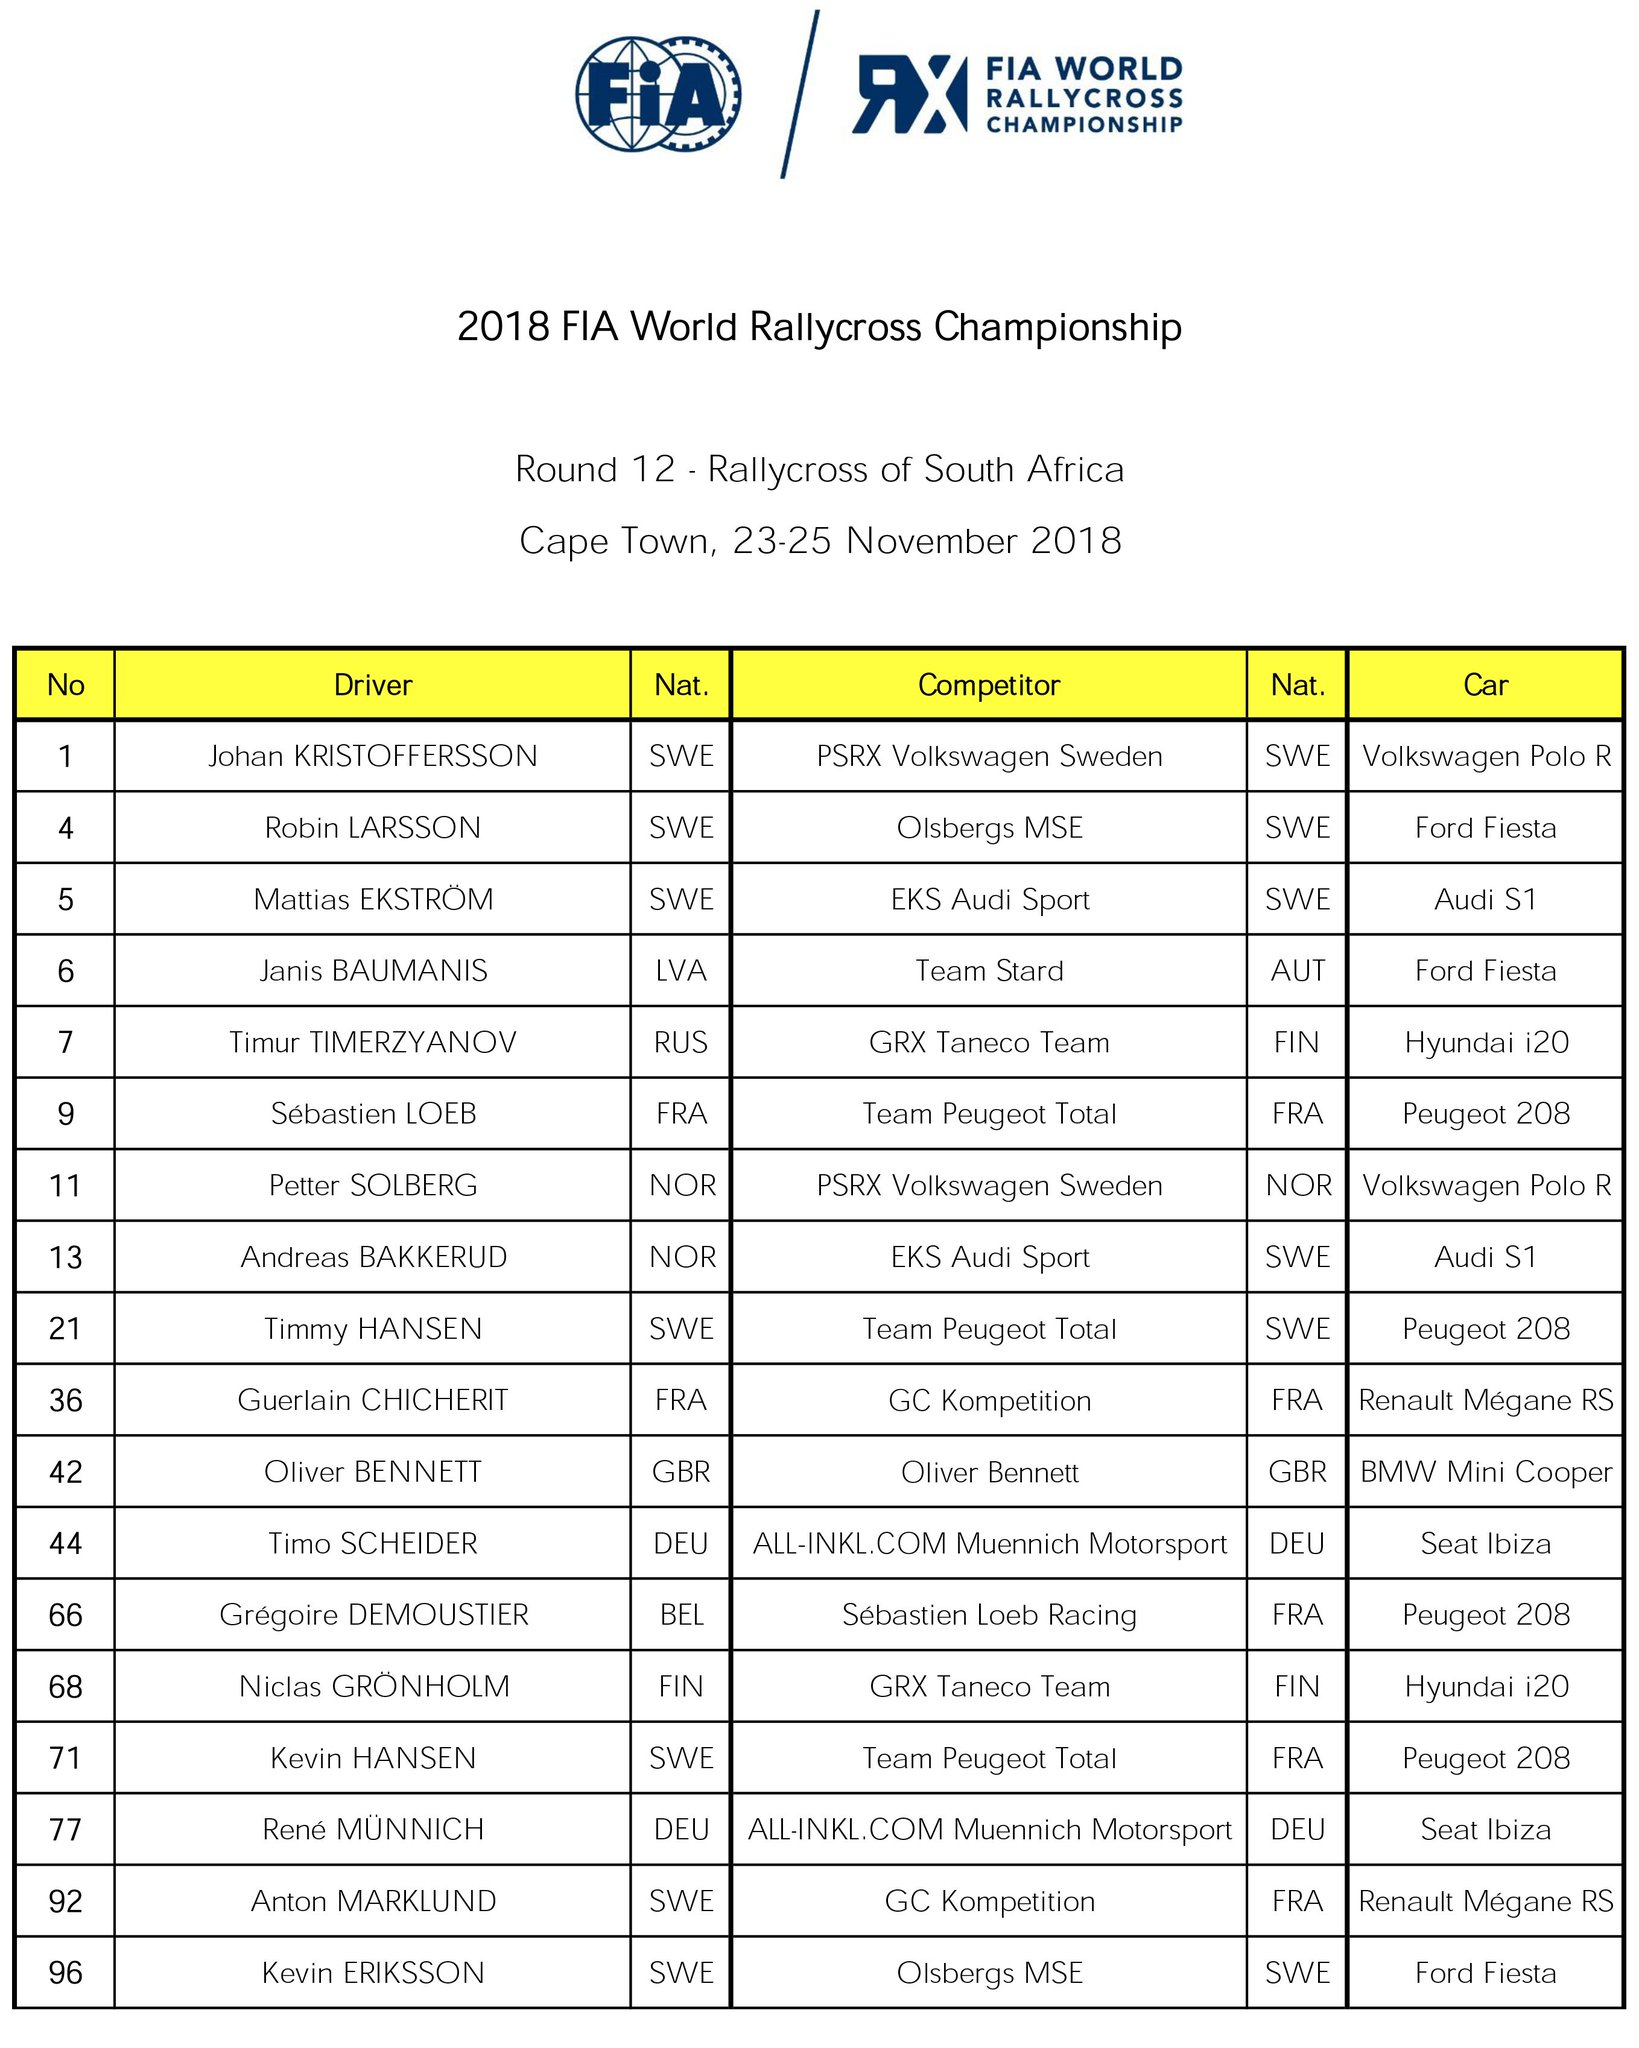 Mundial de Rallycross: Temporada 2018 - Página 12 Dq2MtW7WoAEeueC